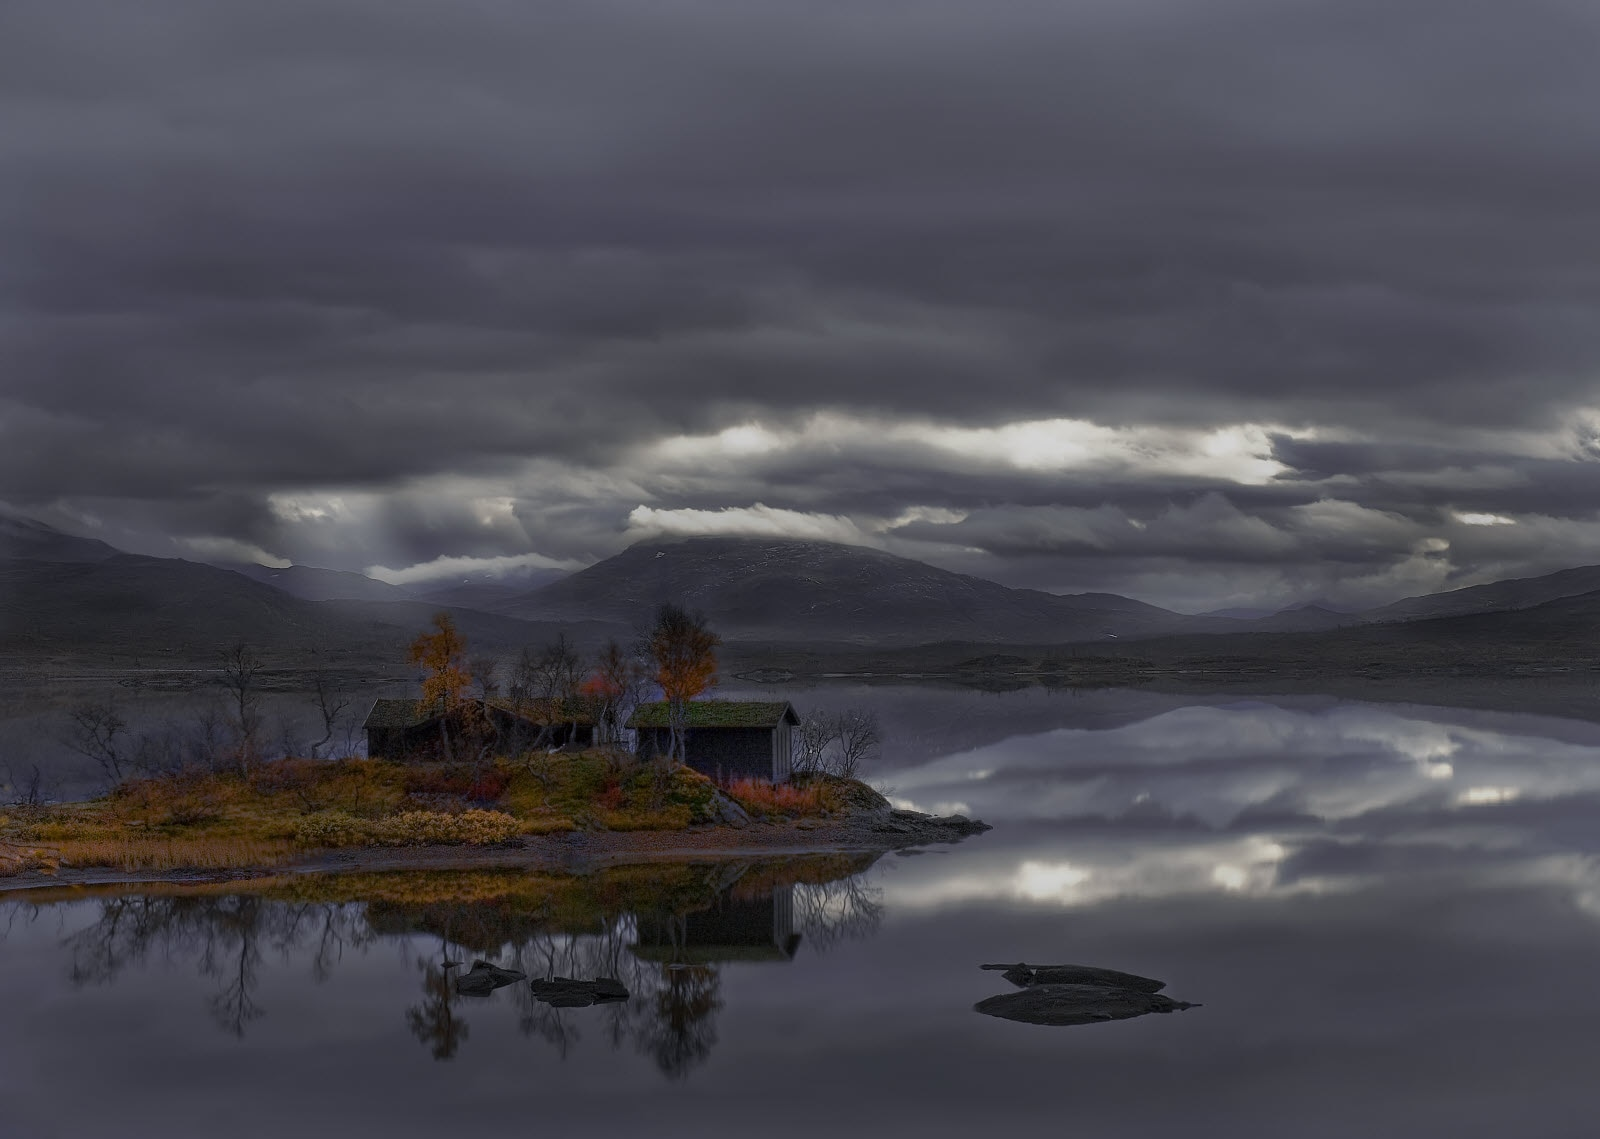 eskorte kristiansand broer i norge